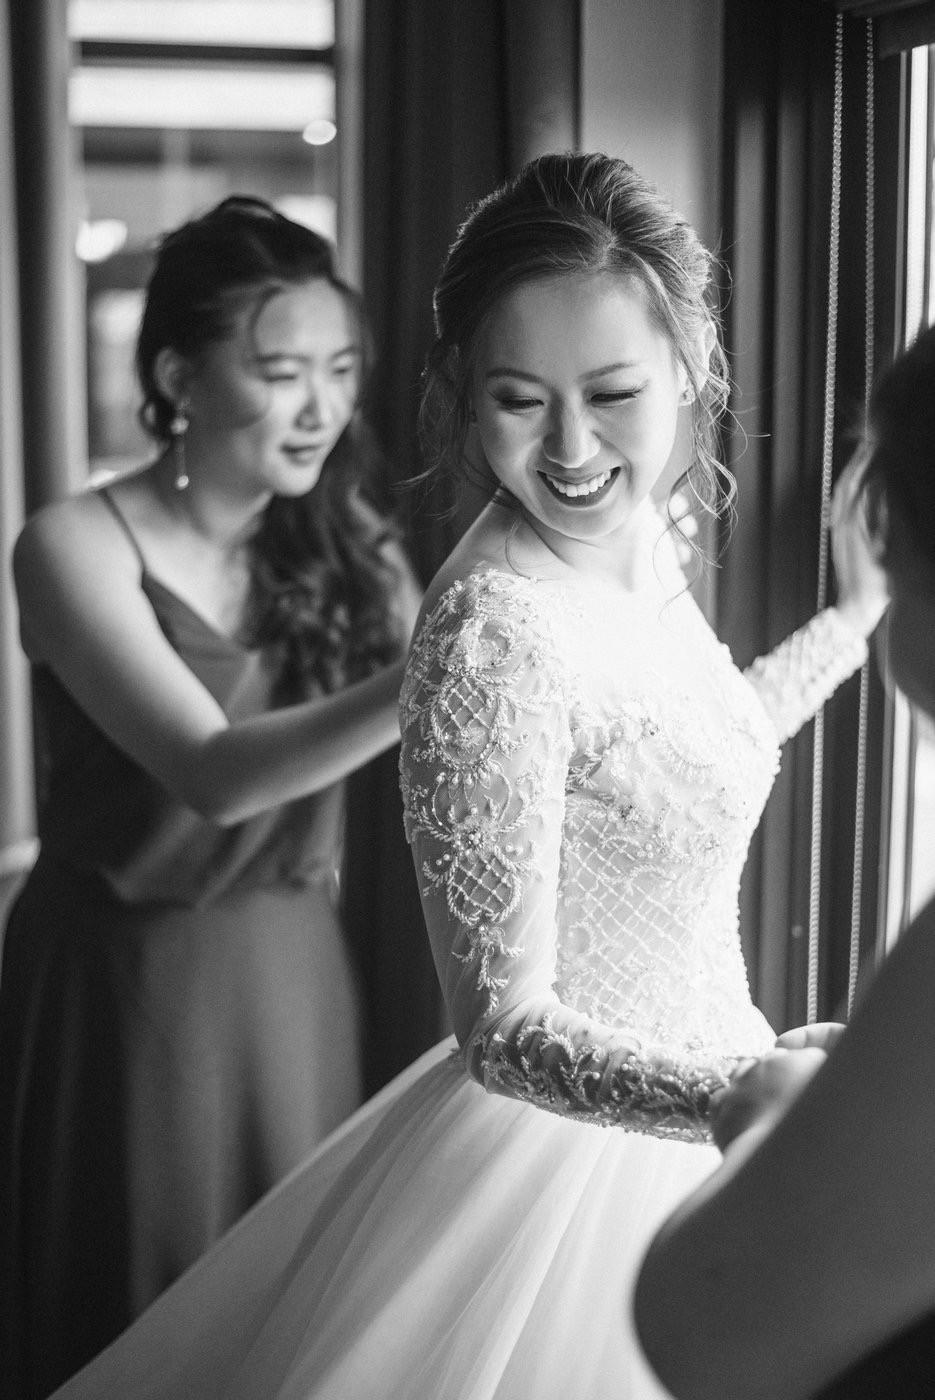 Change & Wei Wedding-Sense Events-多伦多婚礼策-Bridal party 5